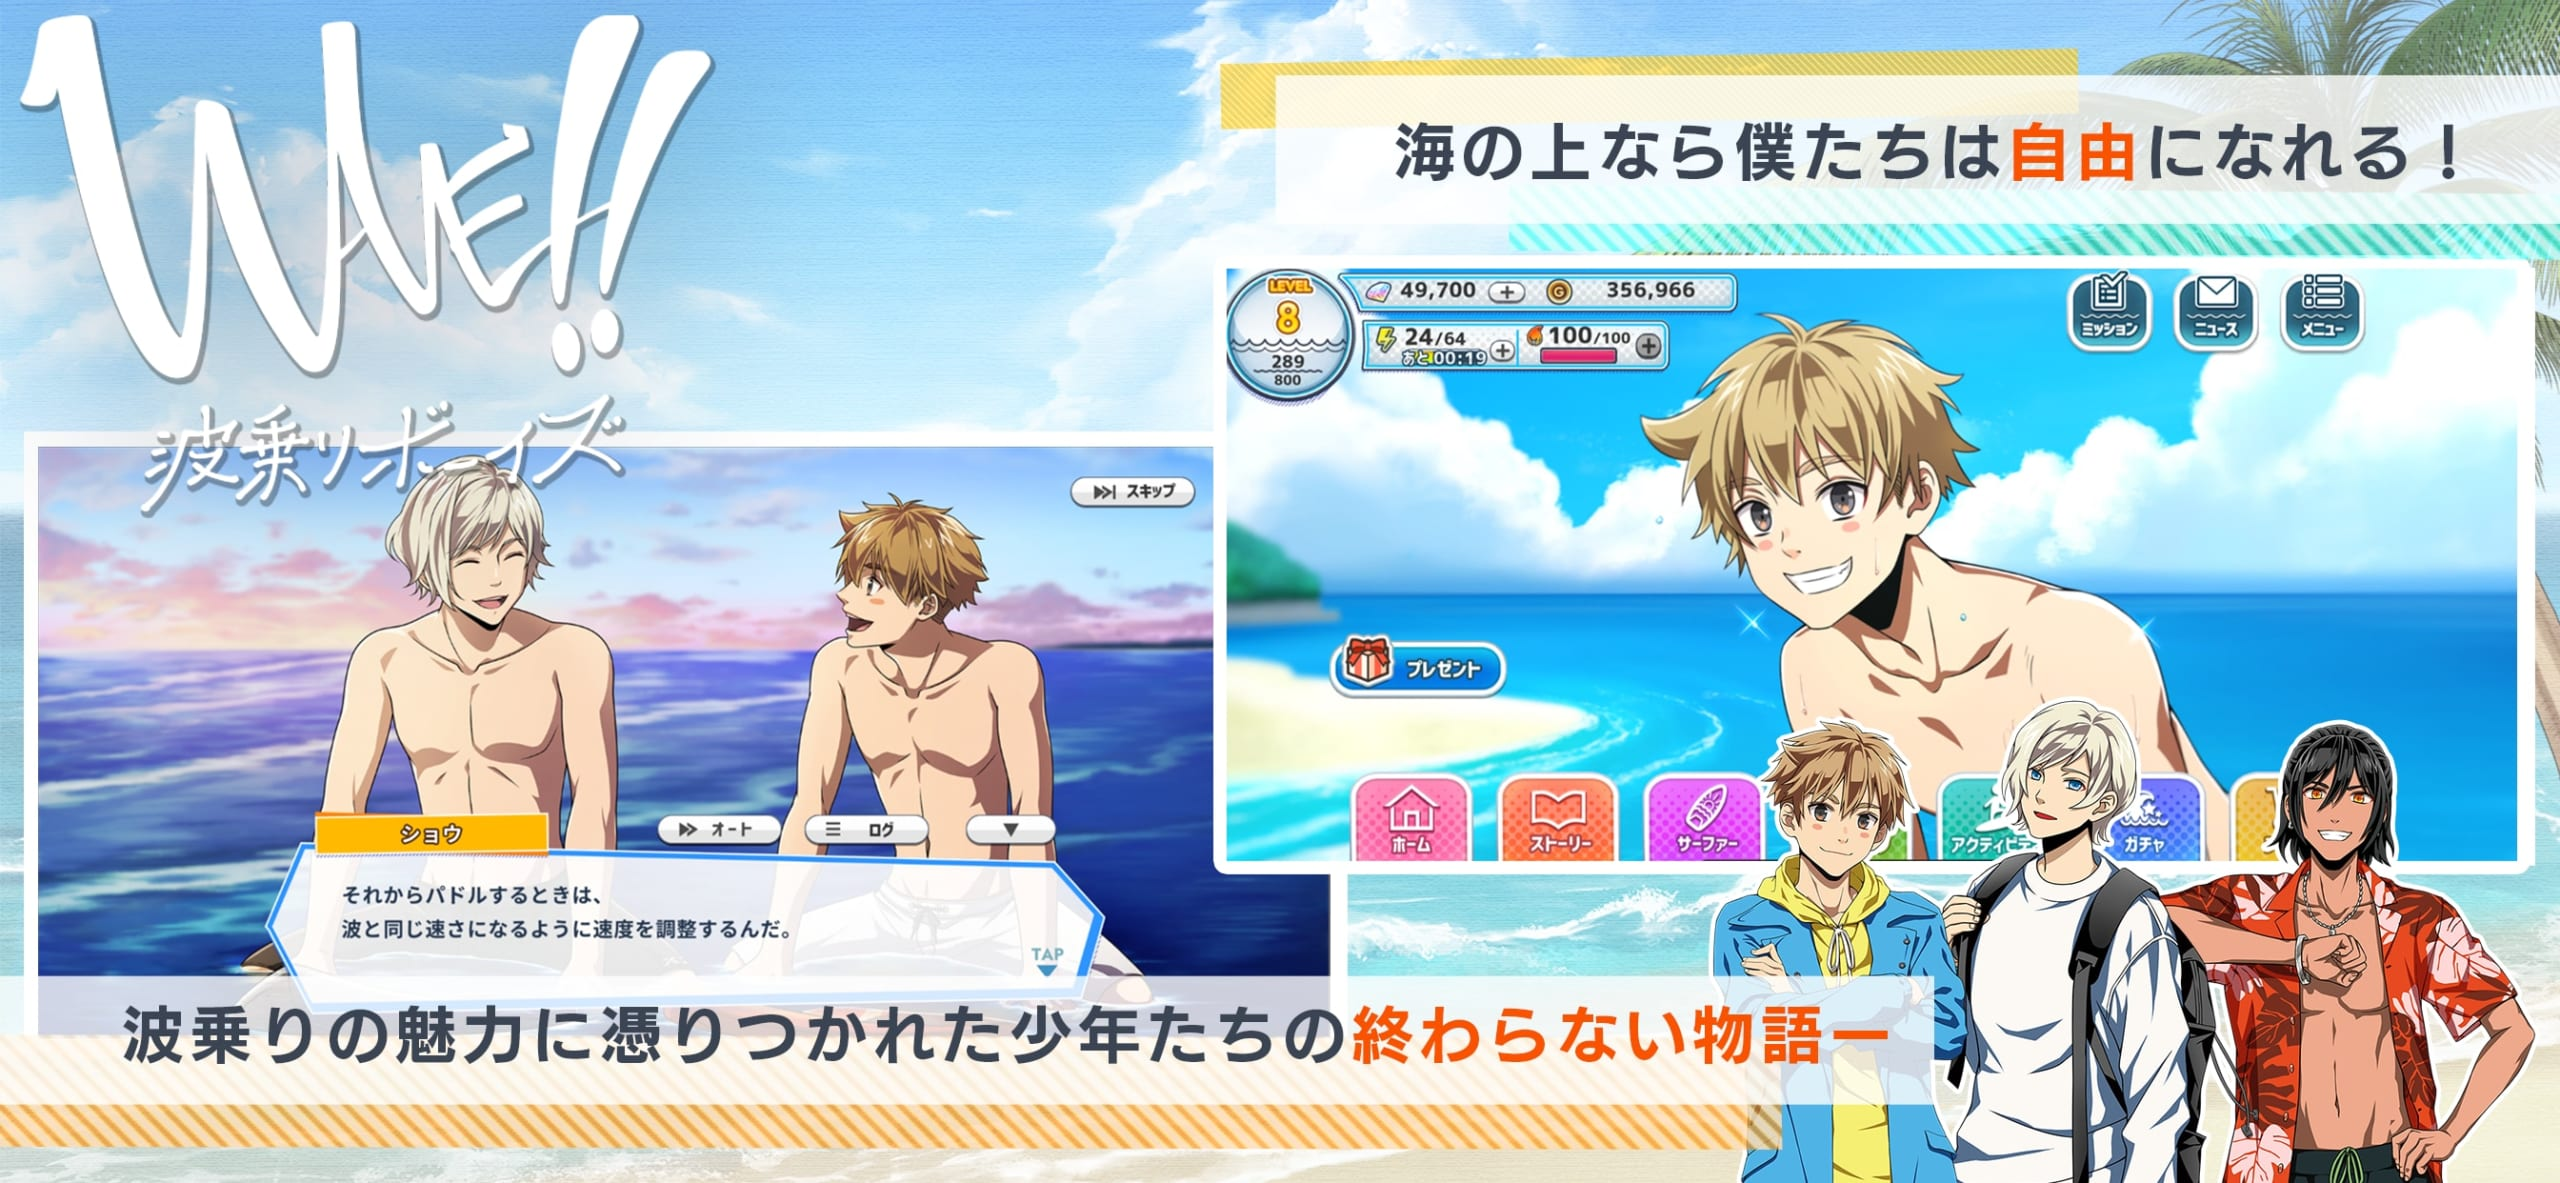 「WAVE!!〜波乗りボーイズ〜」ゲーム画面1